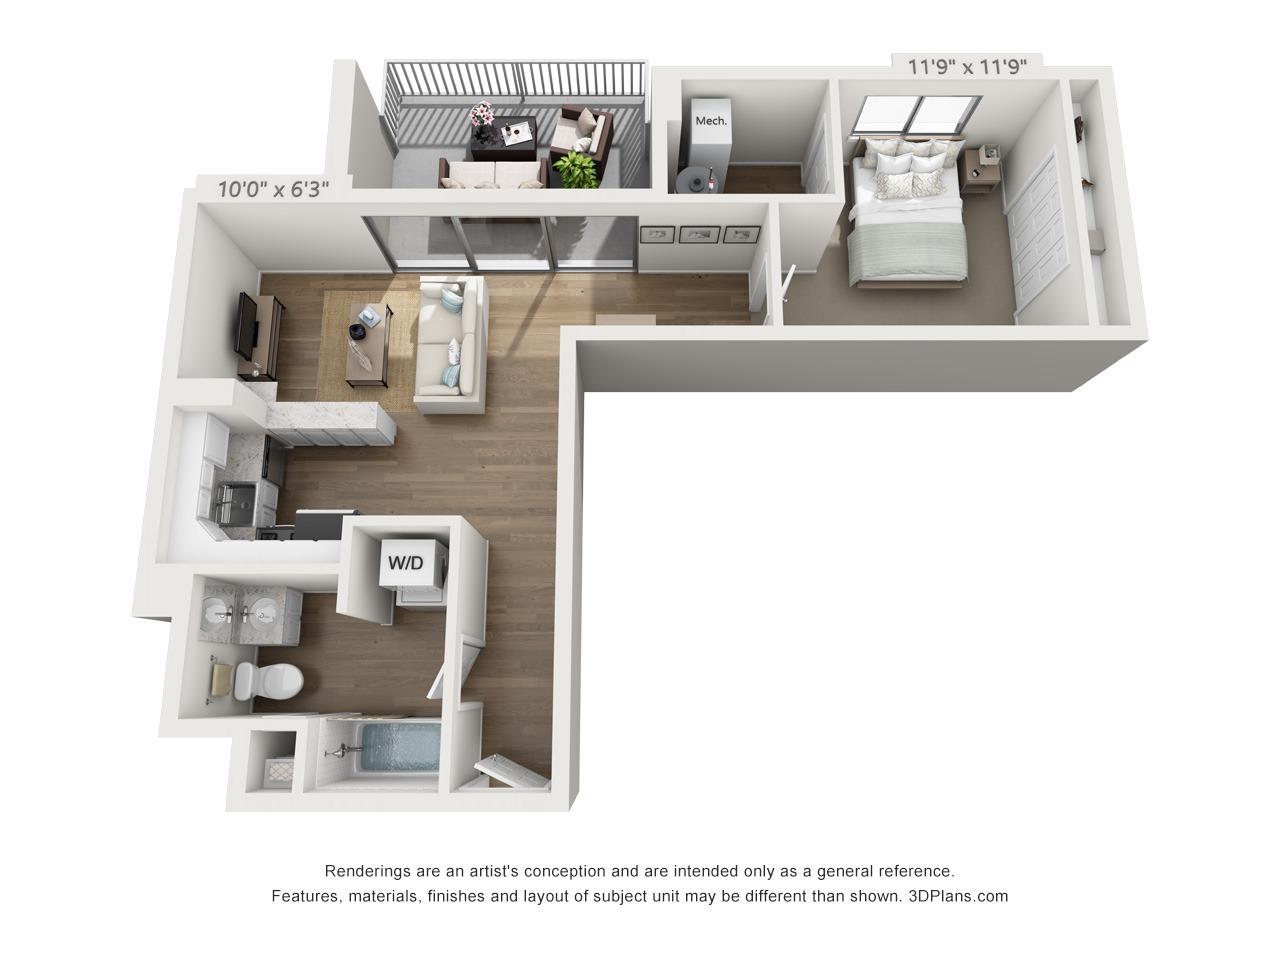 1 bedroom penthouse in east falls